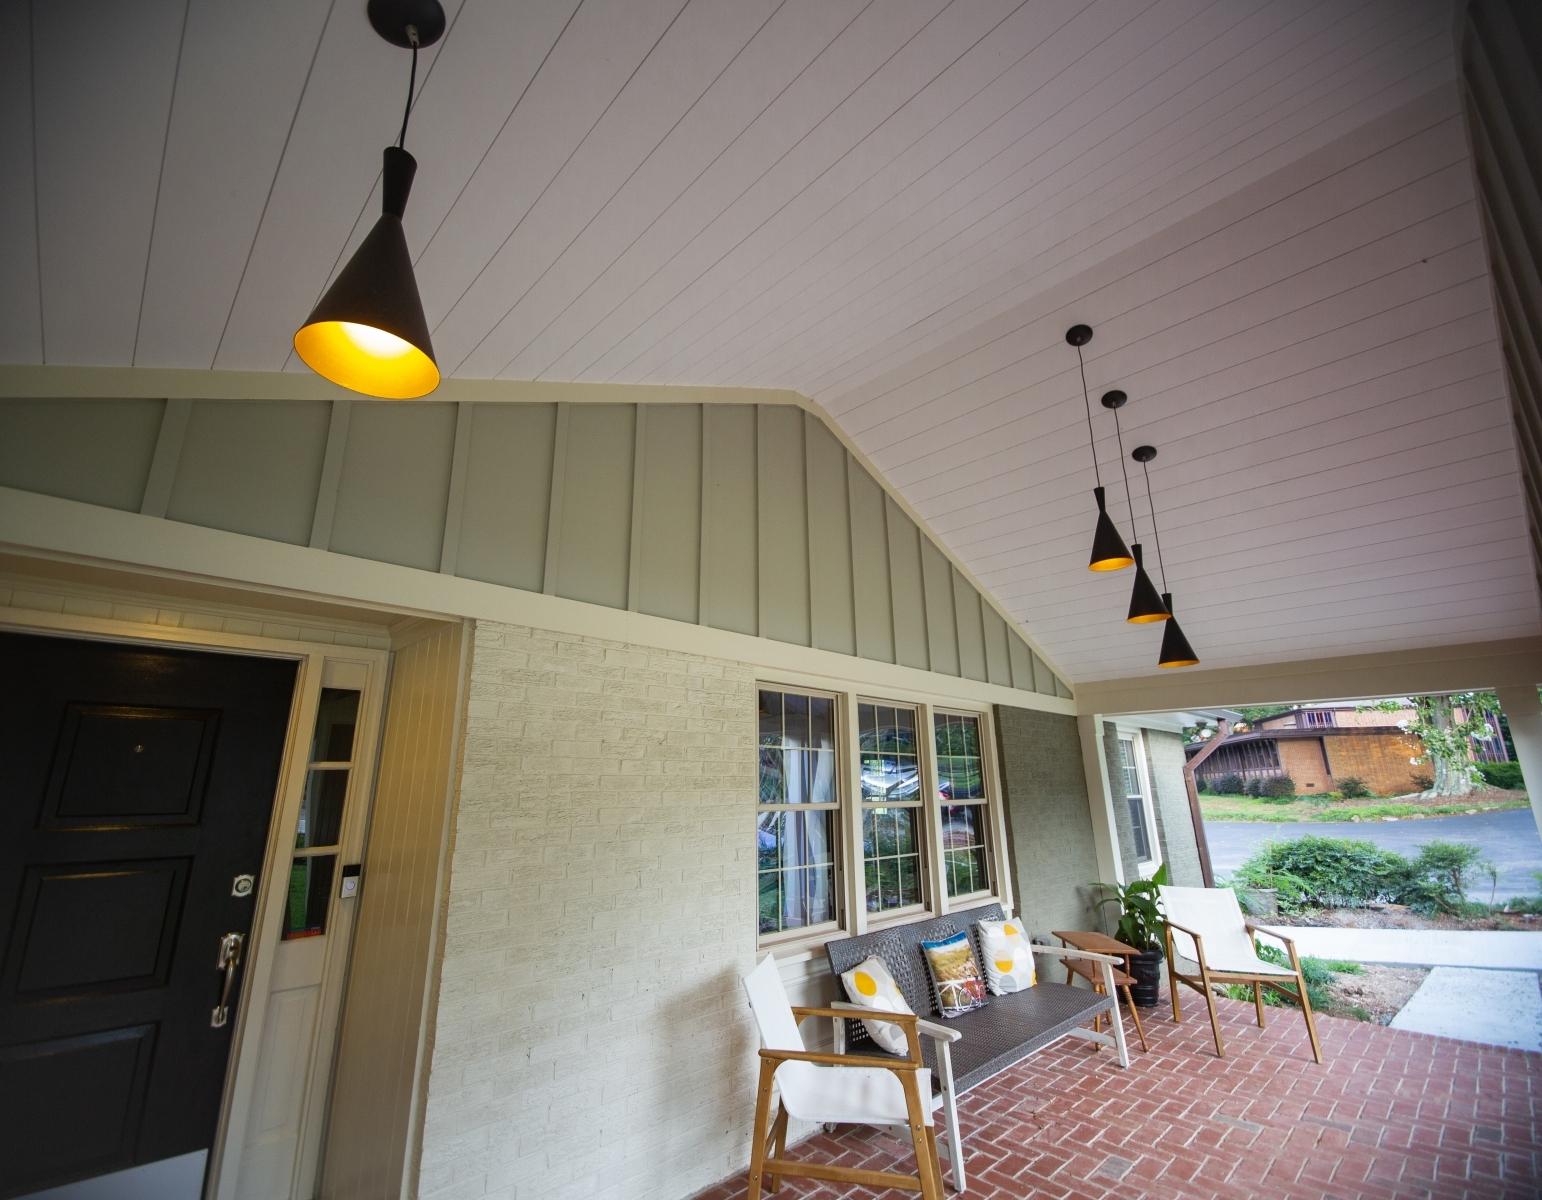 1_33-sa-front-porch-addition-1